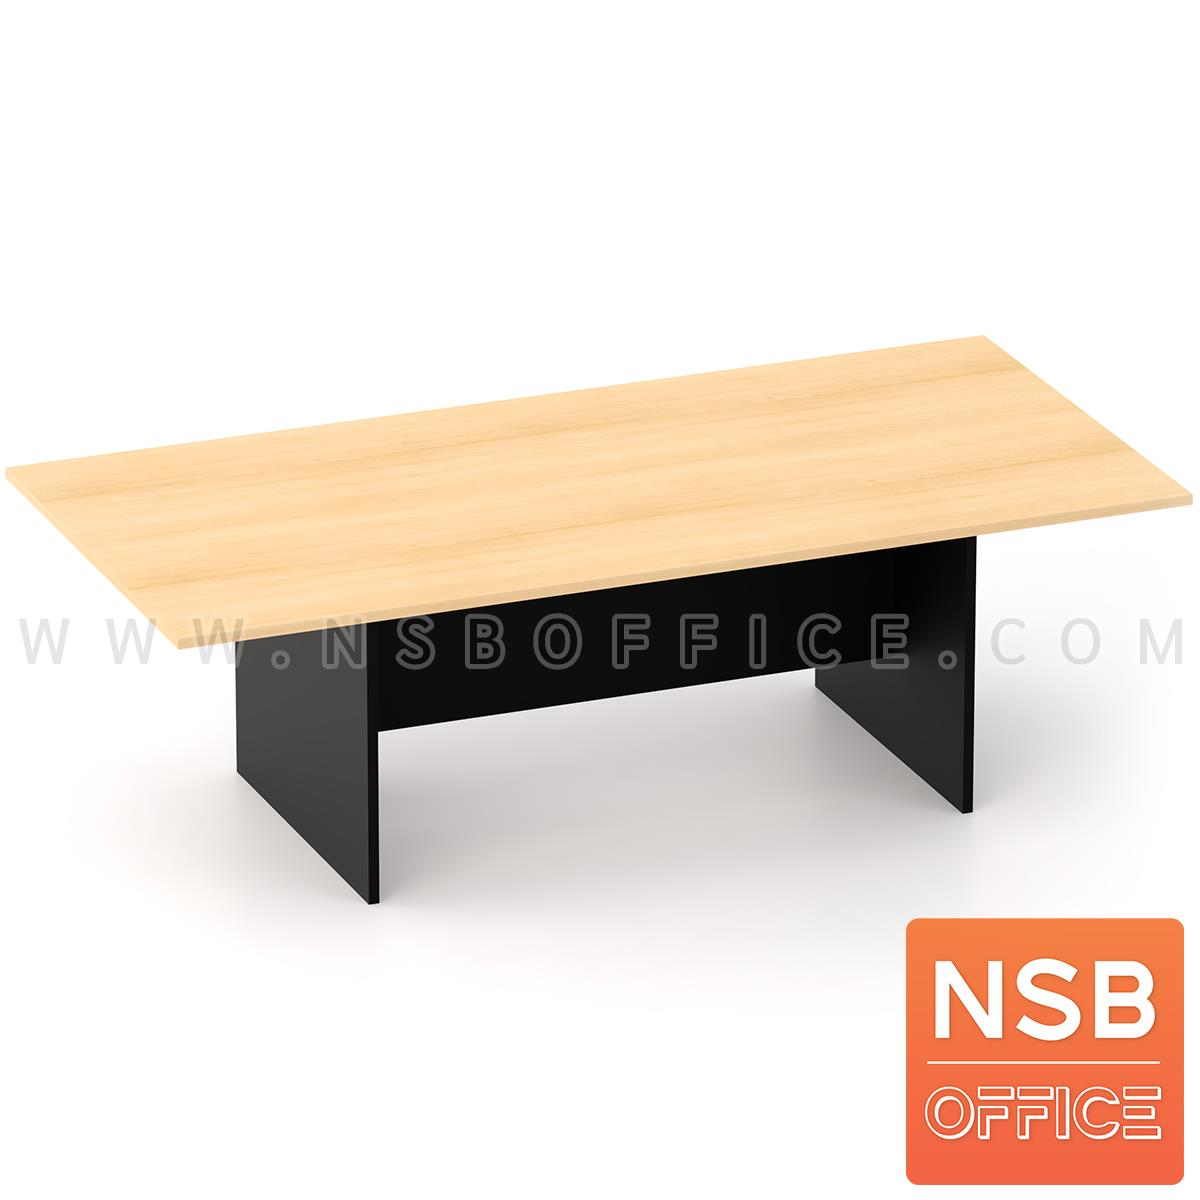 A05A052:โต๊ะประชุมทรงสี่เหลี่ยม  รุ่น Seaton (ซีตัน) ขนาด 165W ,180W ,200W ,240W cm.  เมลามีน รุ่นพิเศษ ขาหนา 25 มม.